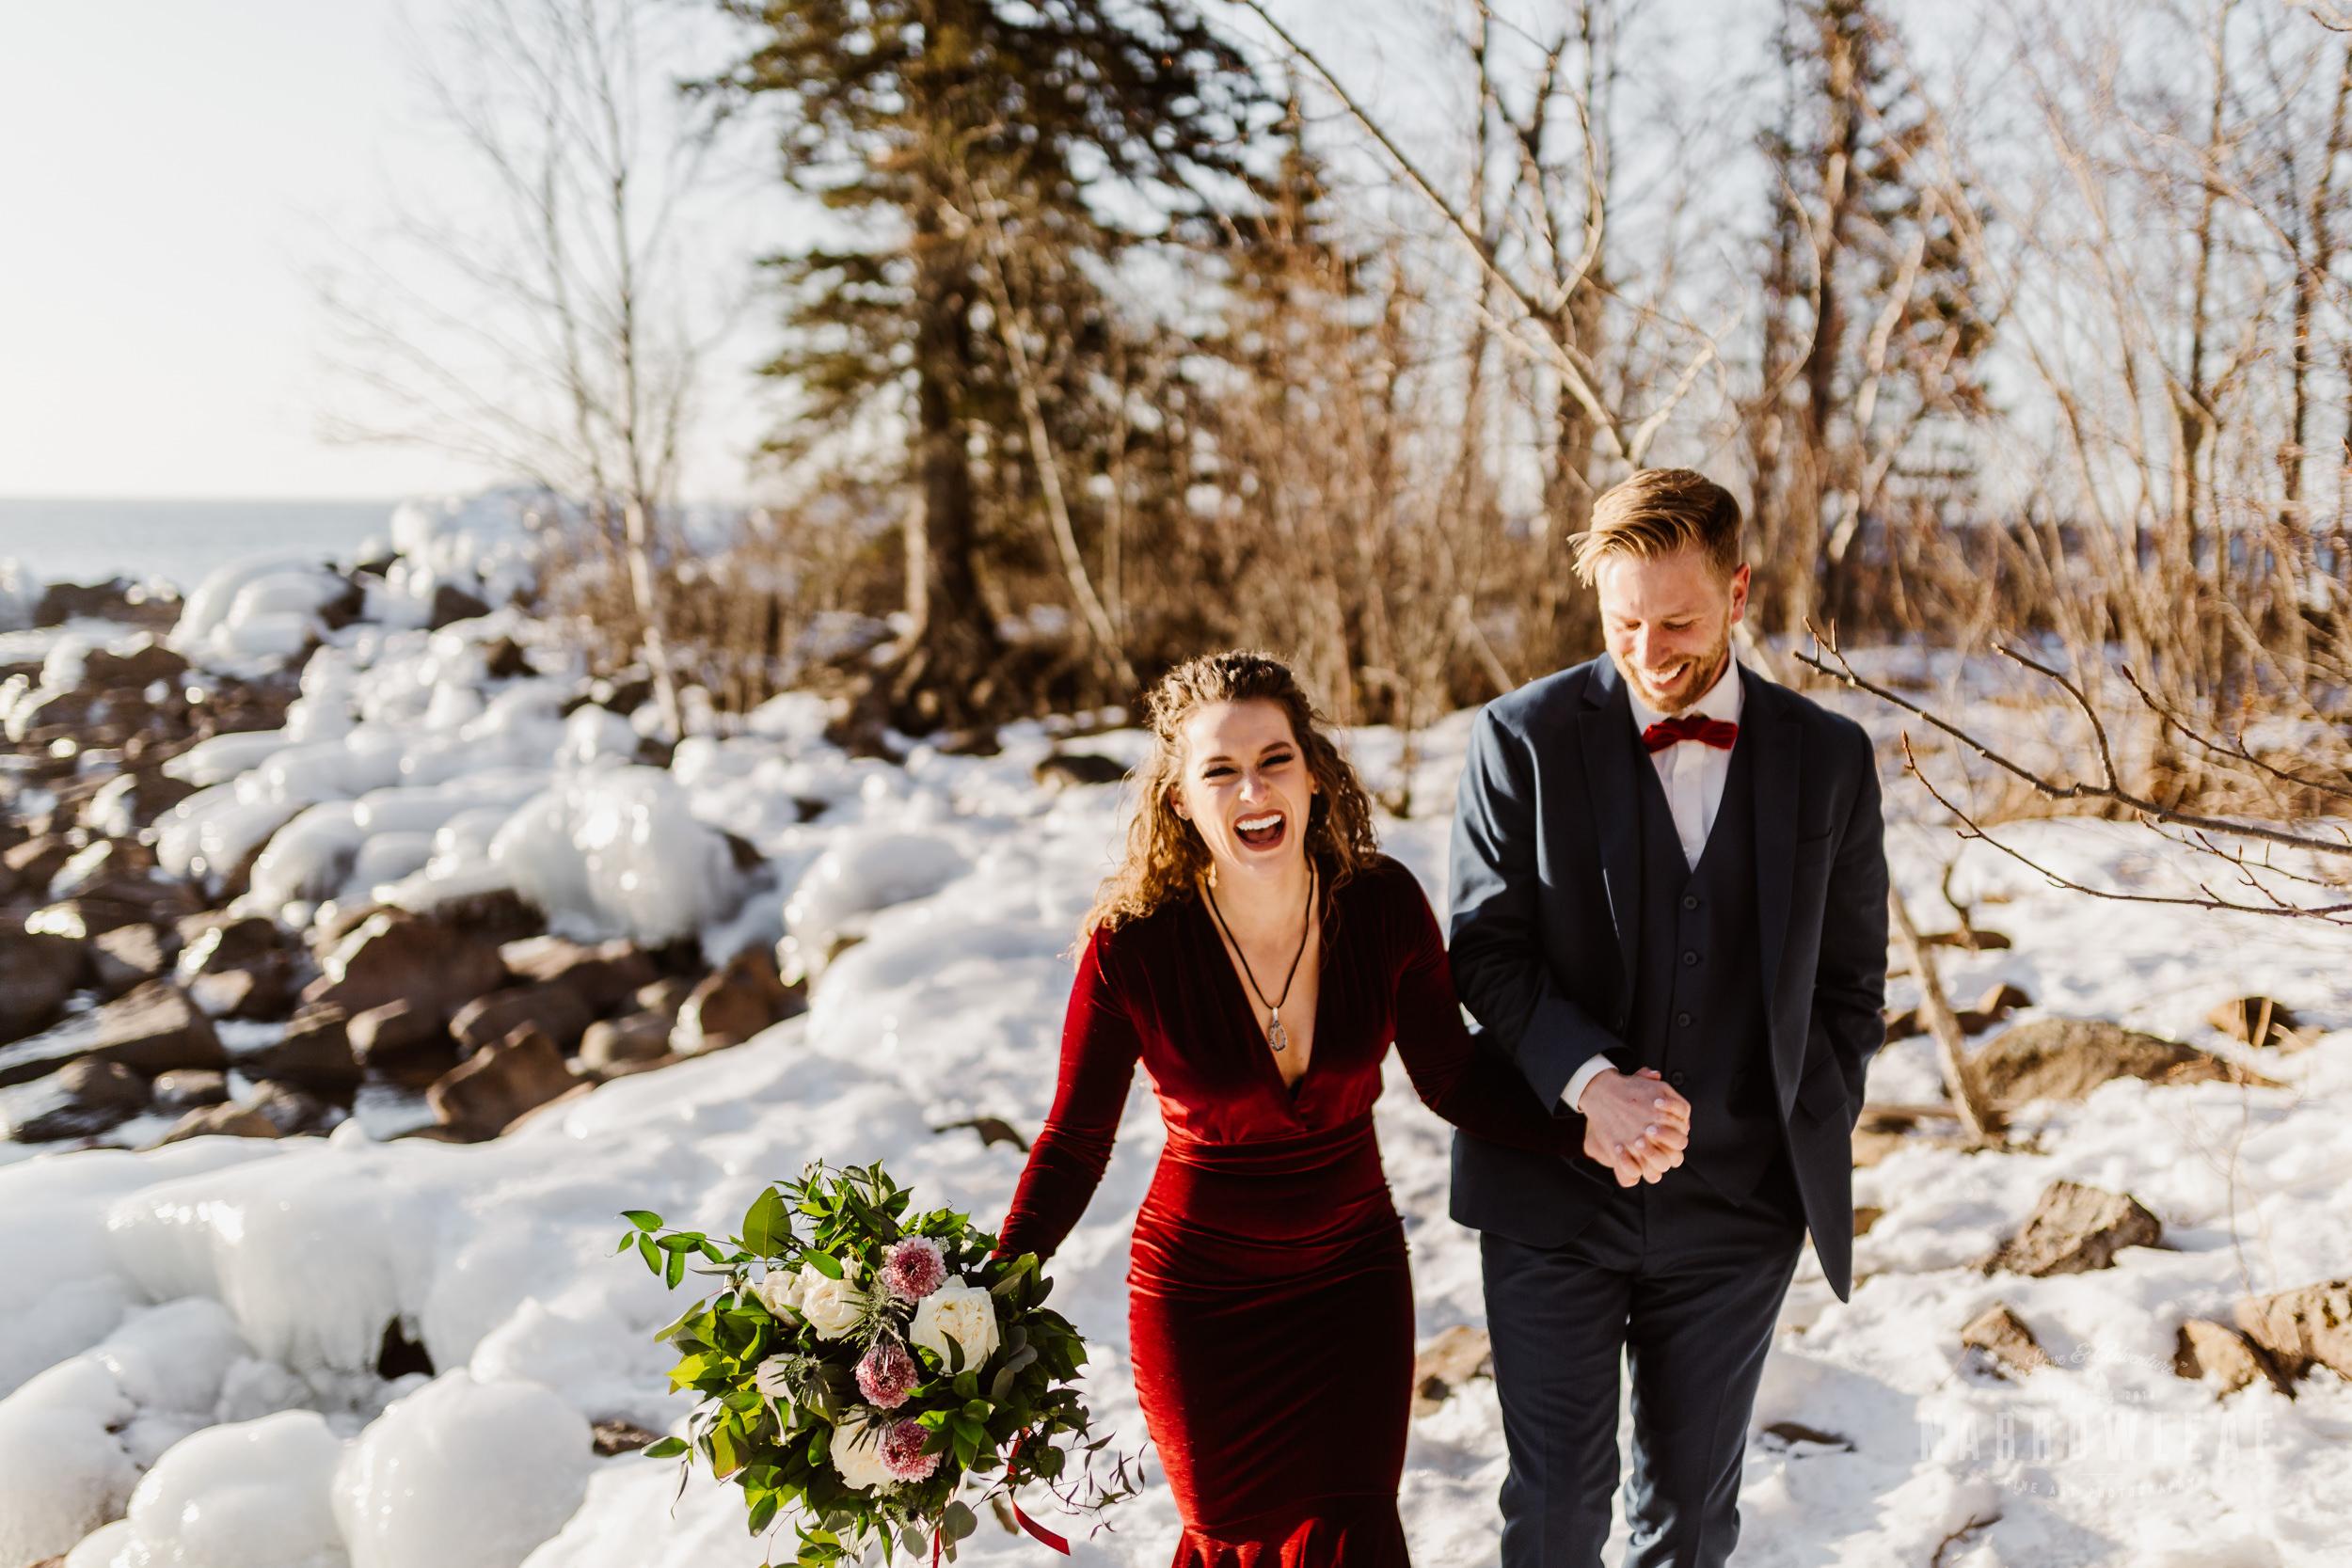 winter-adventure-elopement-tettegouche-state-park-minnesota-Narrowleaf_Love_and_Adventure_Photography-8699.jpg